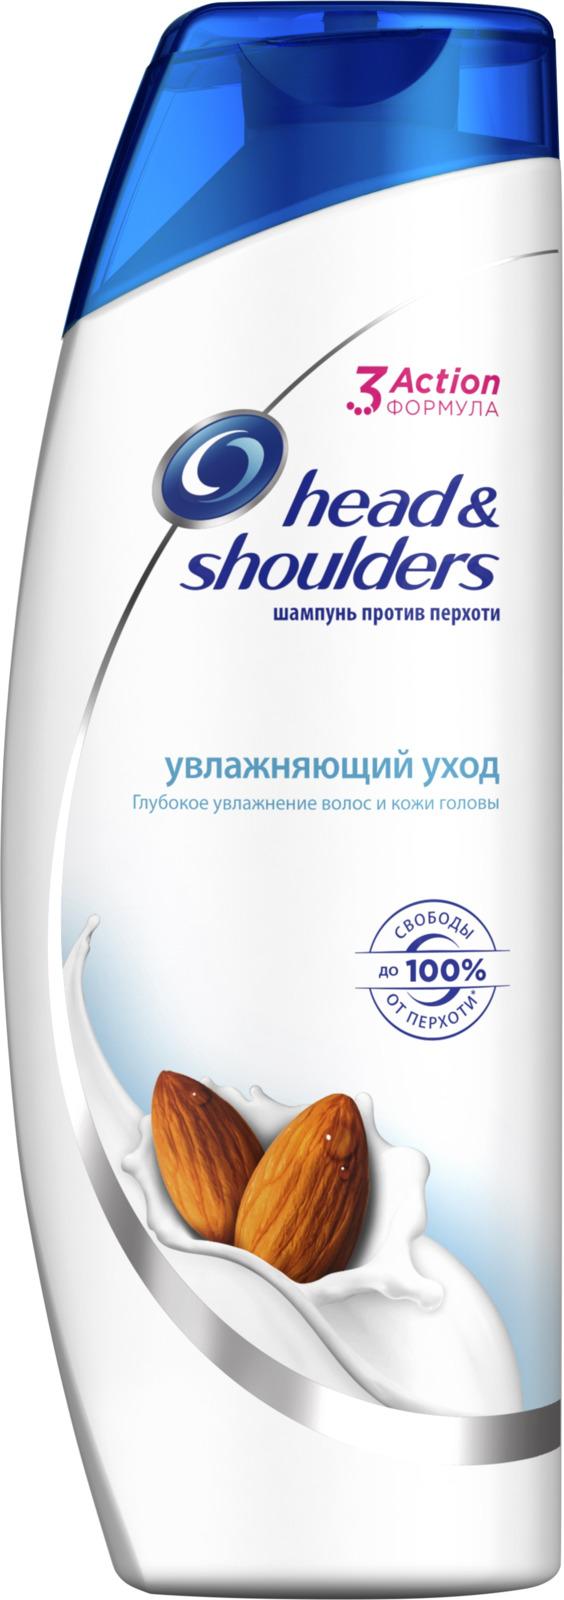 "Шампунь против перхоти Head&Shoulders ""Увлажняющий уход за кожей головы"", 400 мл"